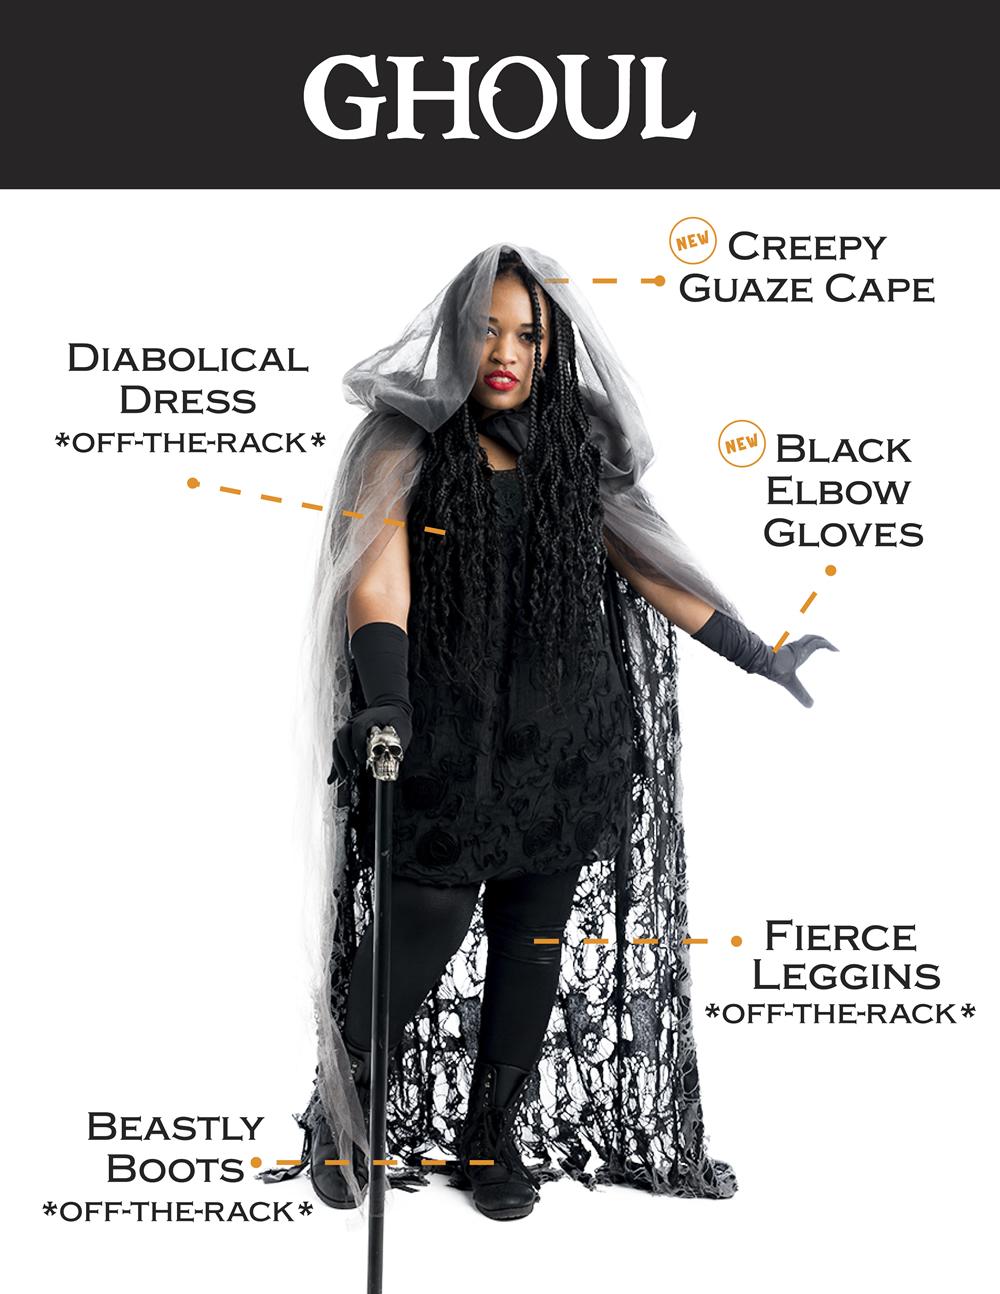 Ghoul: creepy gauze cape, black elbow gloves